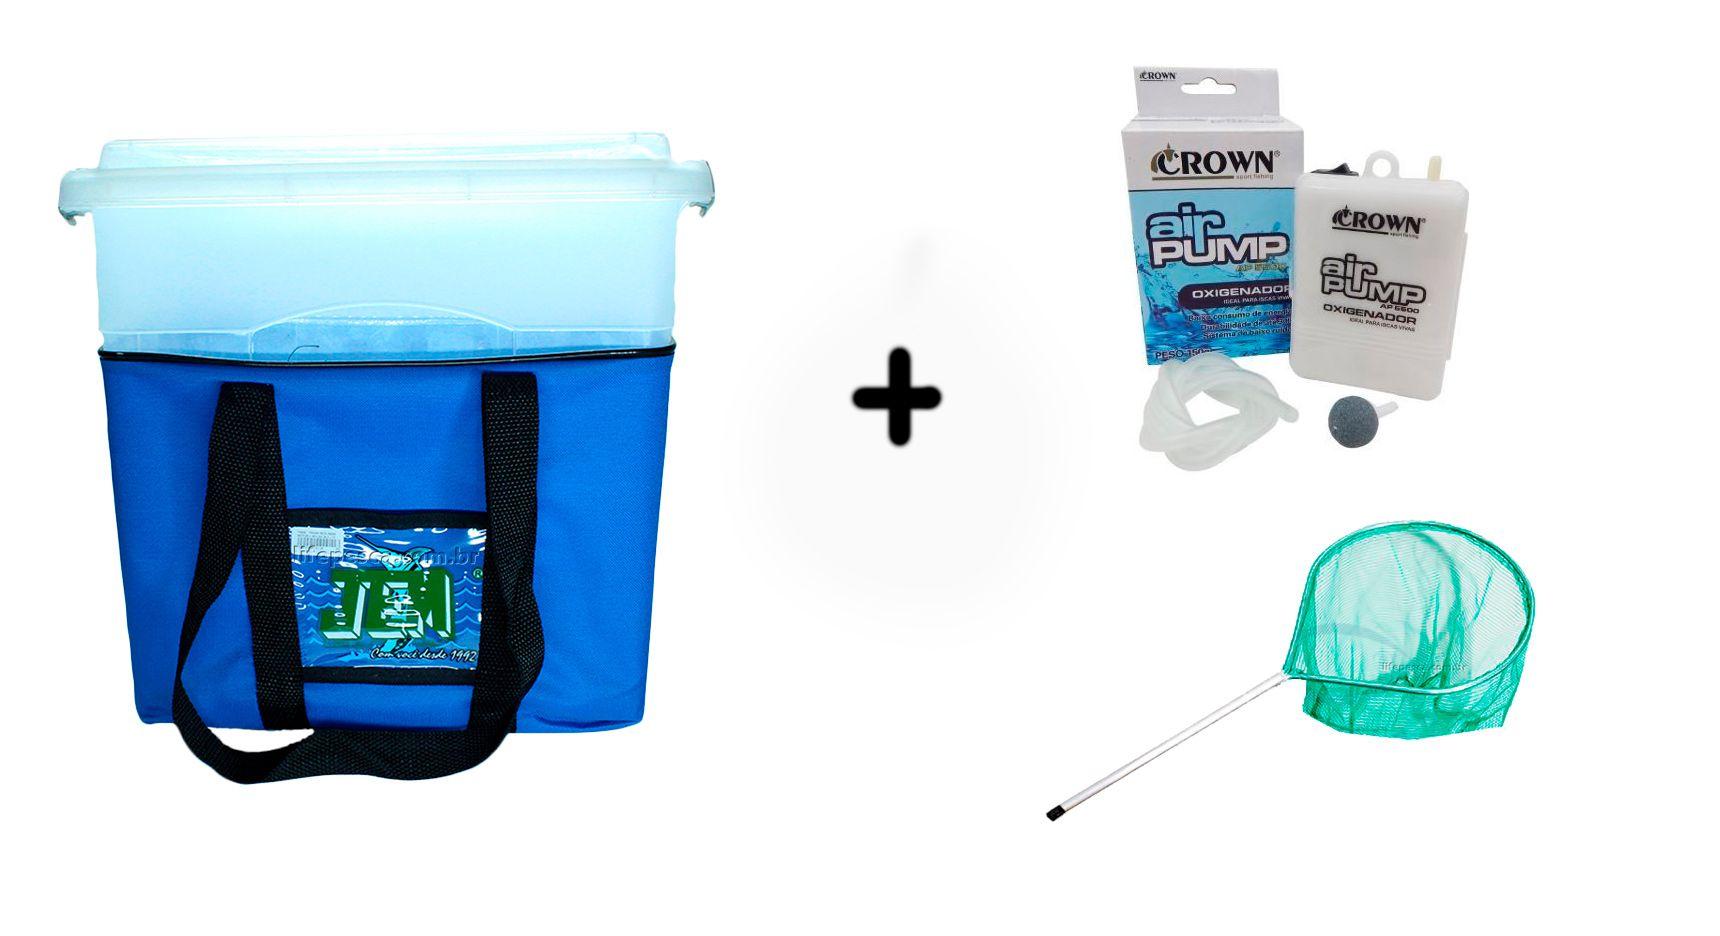 Kit Transisca Jem 26,5 Lts + Oxigenador Crown + Passaguá Mini